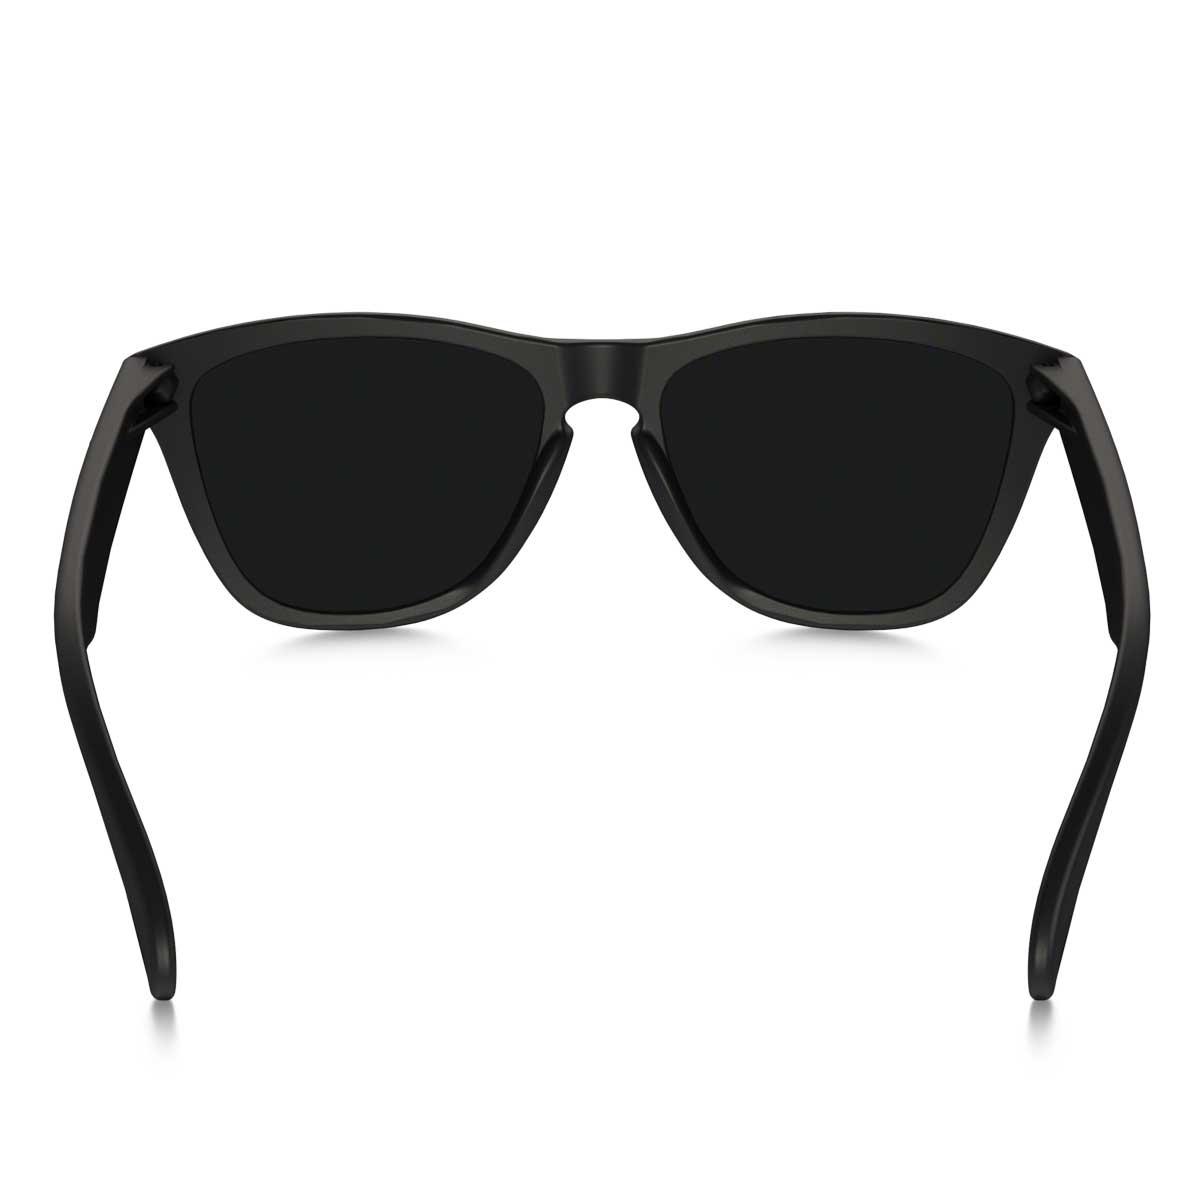 4dd24c87bc9 Oakley Frogskin Sunglasses Matte Black Violet Iridium « Heritage Malta